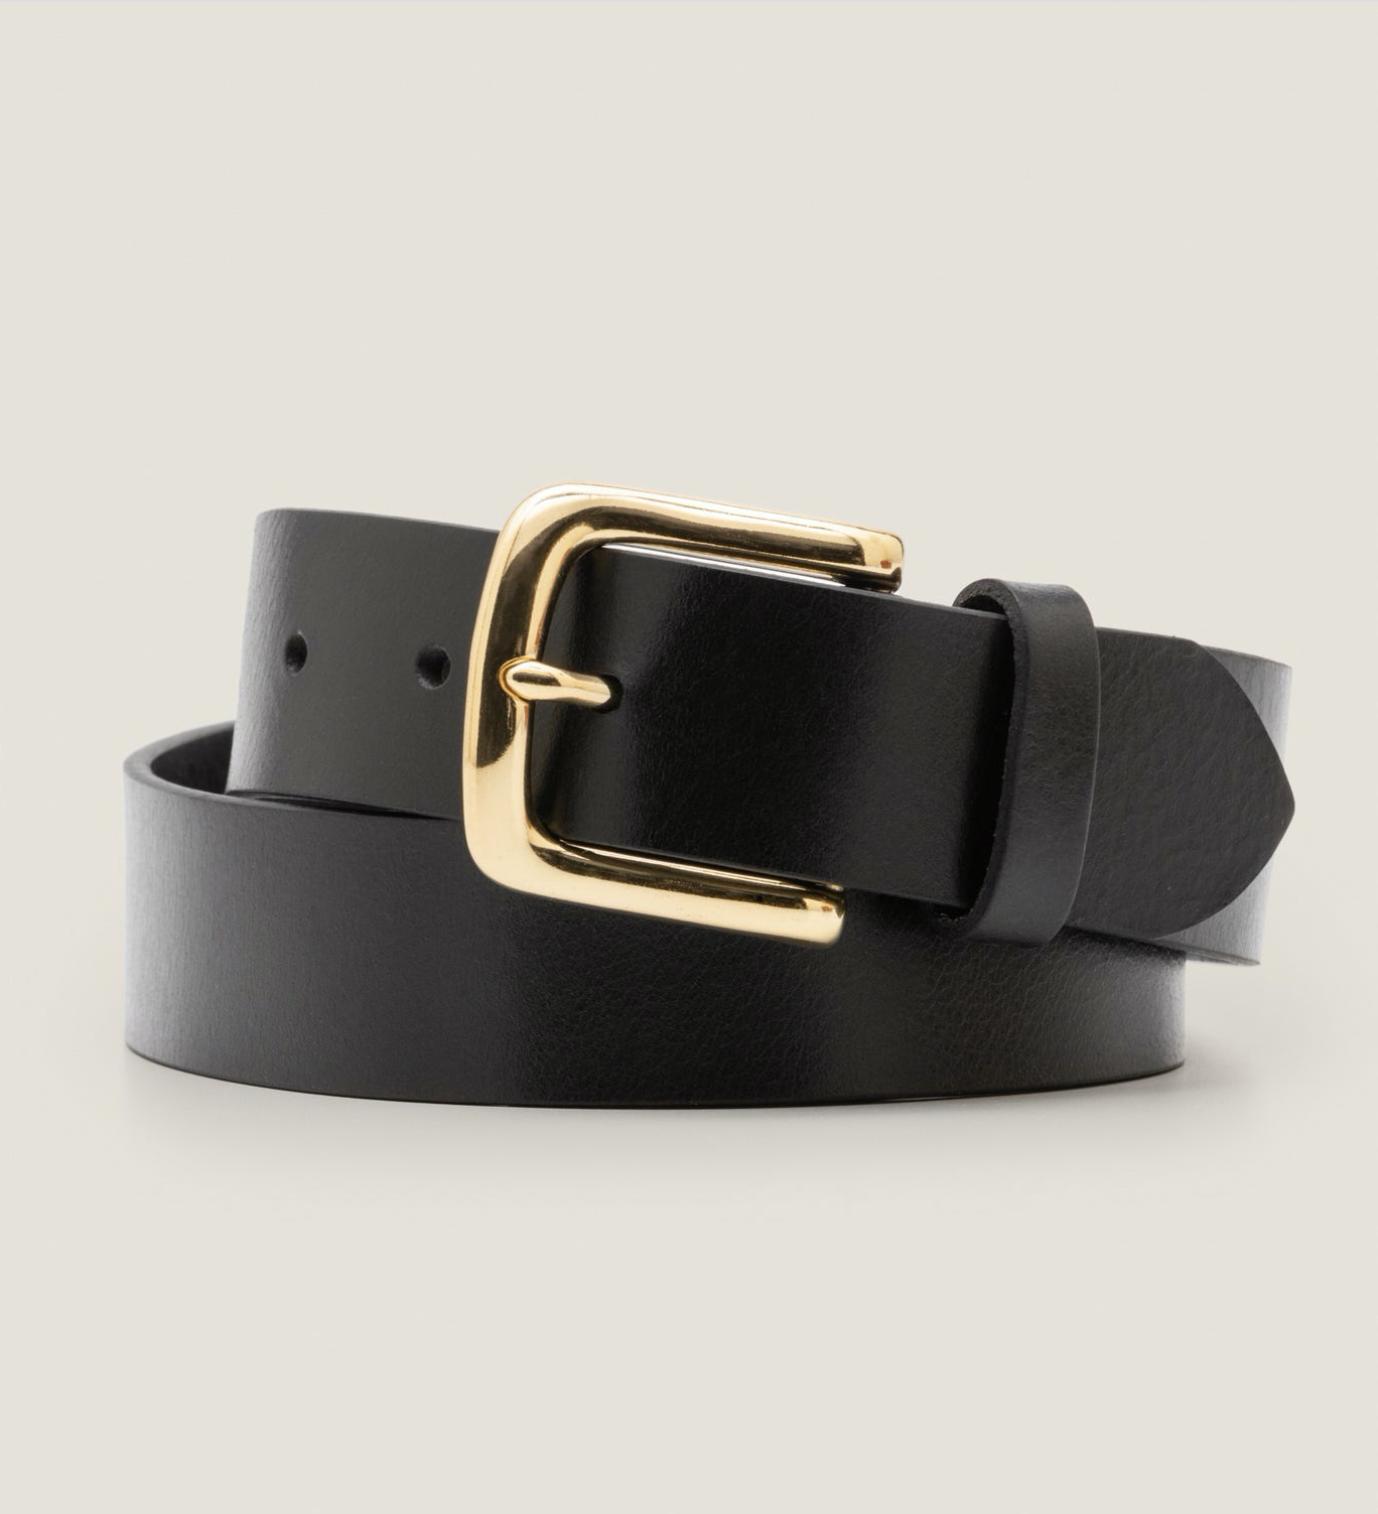 Boden British Belt Black Black Belt Belt Mens Accessories